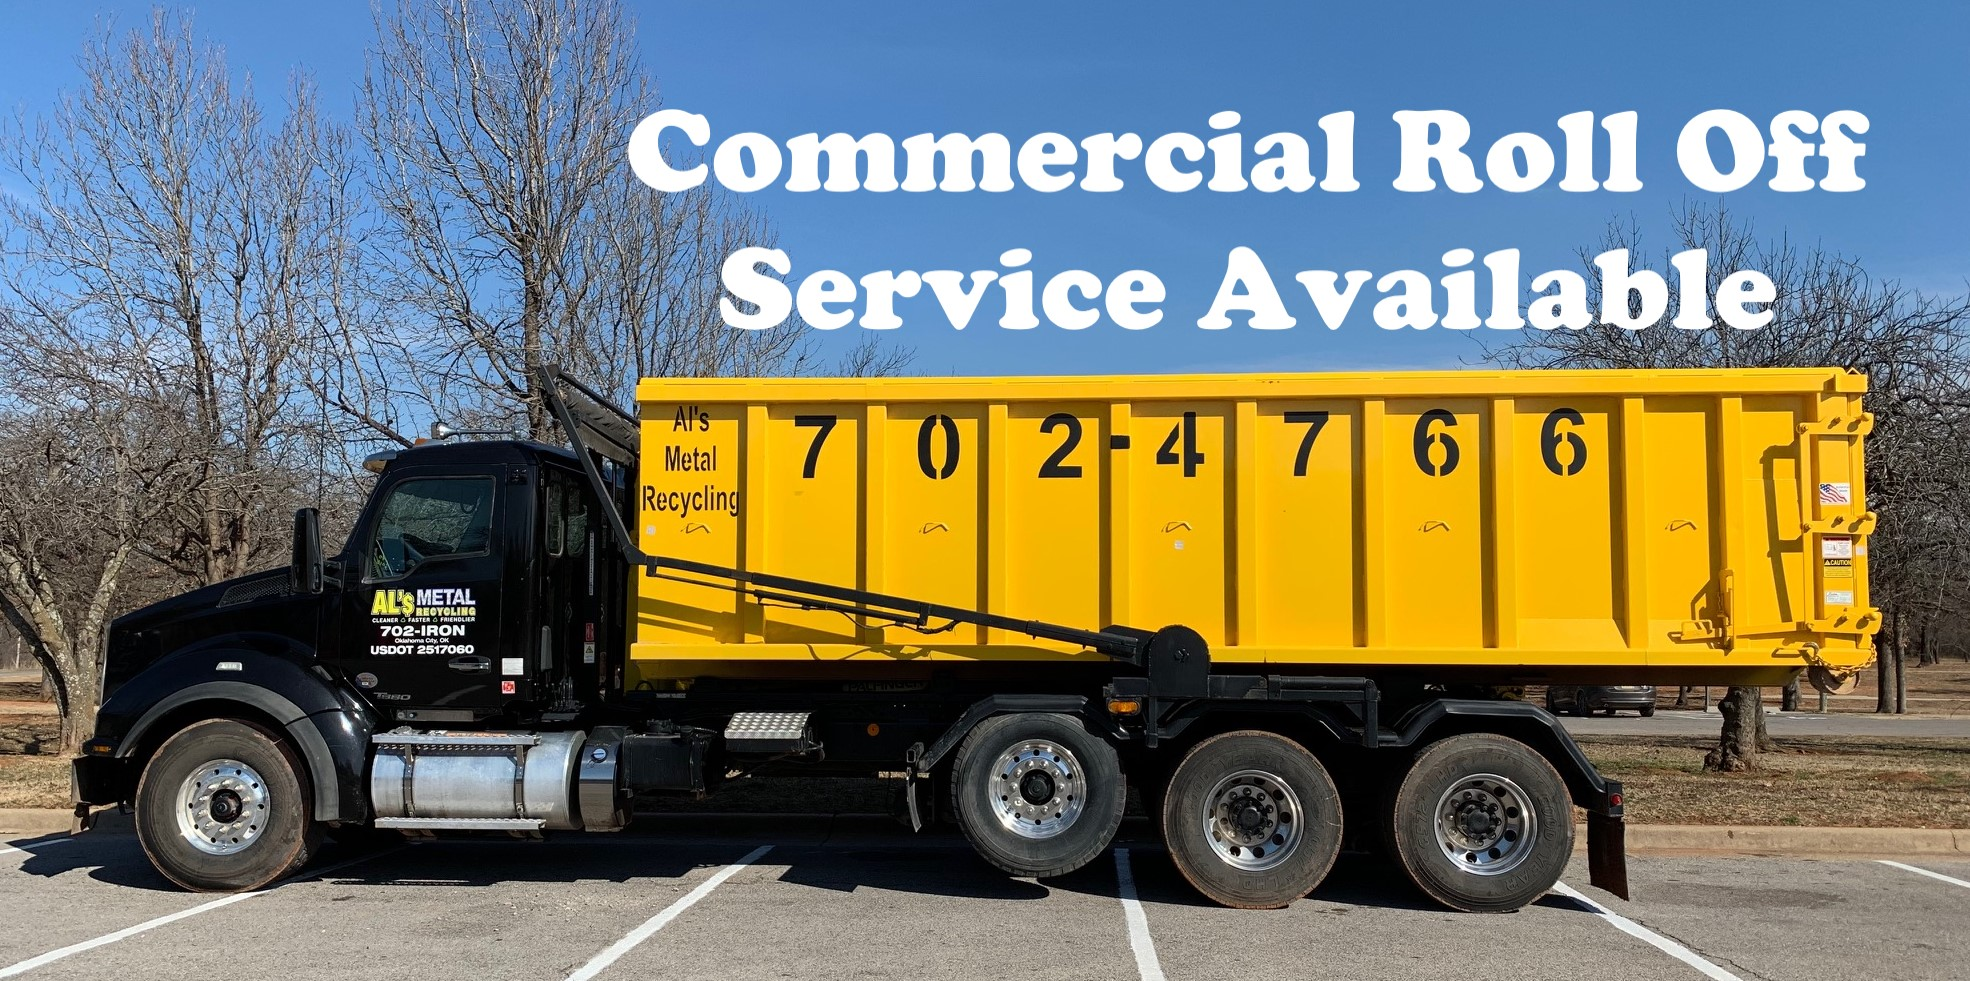 Al's Metal Recycling Oklahoma City, scrap yard, CASH FOR